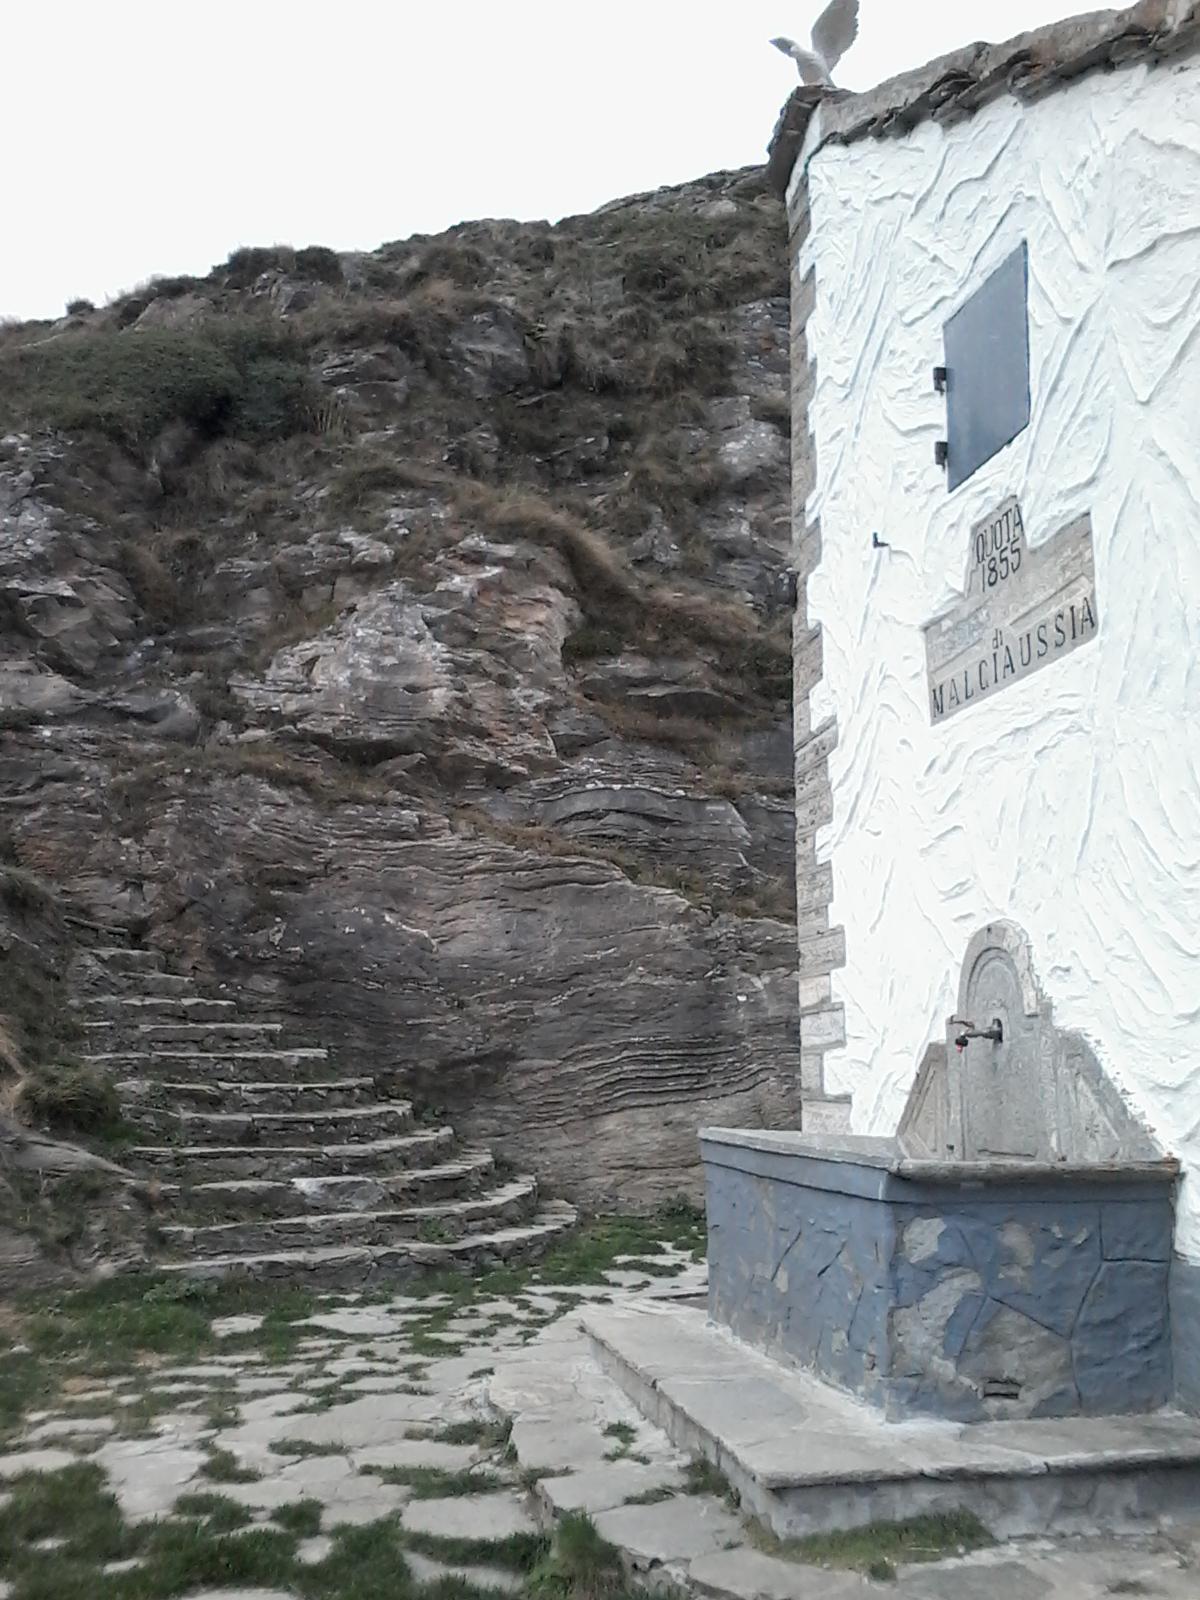 Ex casermetta GaF 'Malciaussia': fontana militare e scala monumentale..